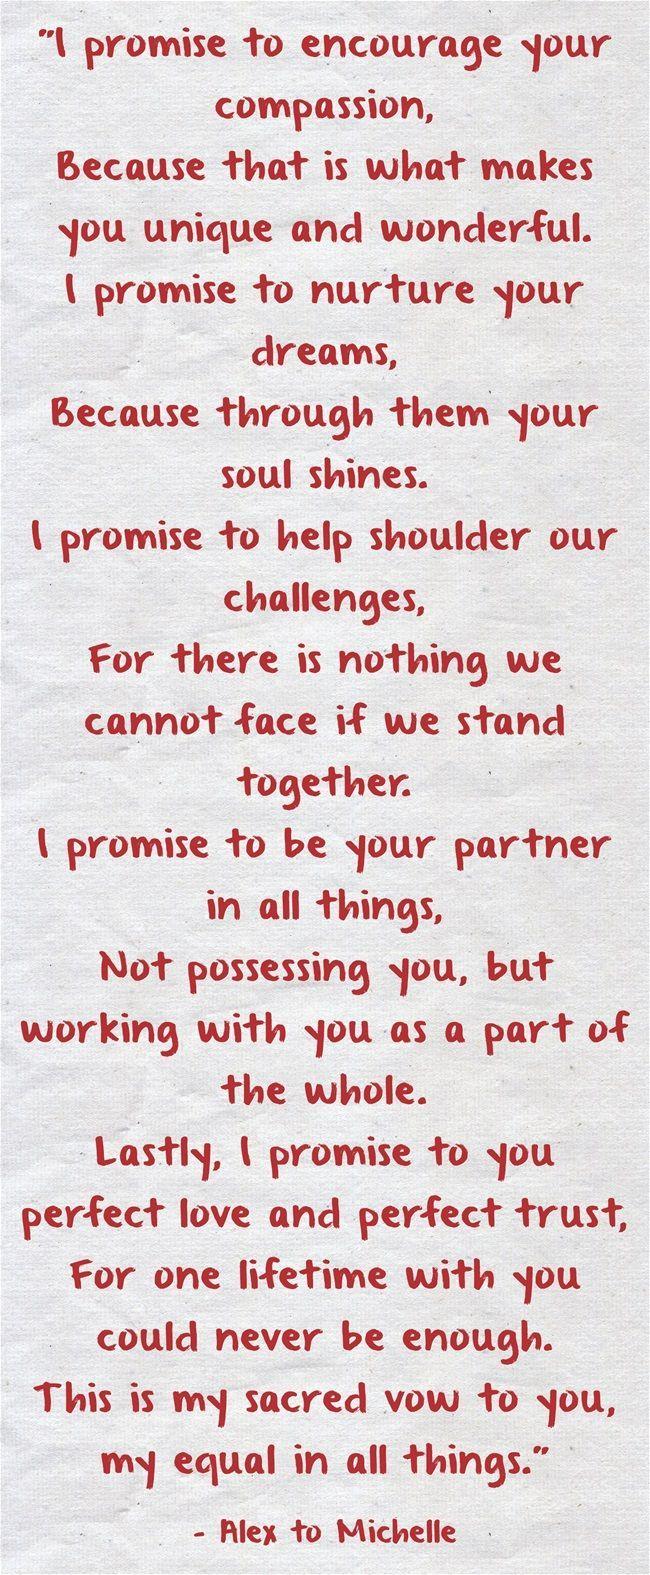 Wedding Vows » 25 Heart-melting Real Couple Wedding Vow Ideas to Make You Cry! #heartcandleswedding